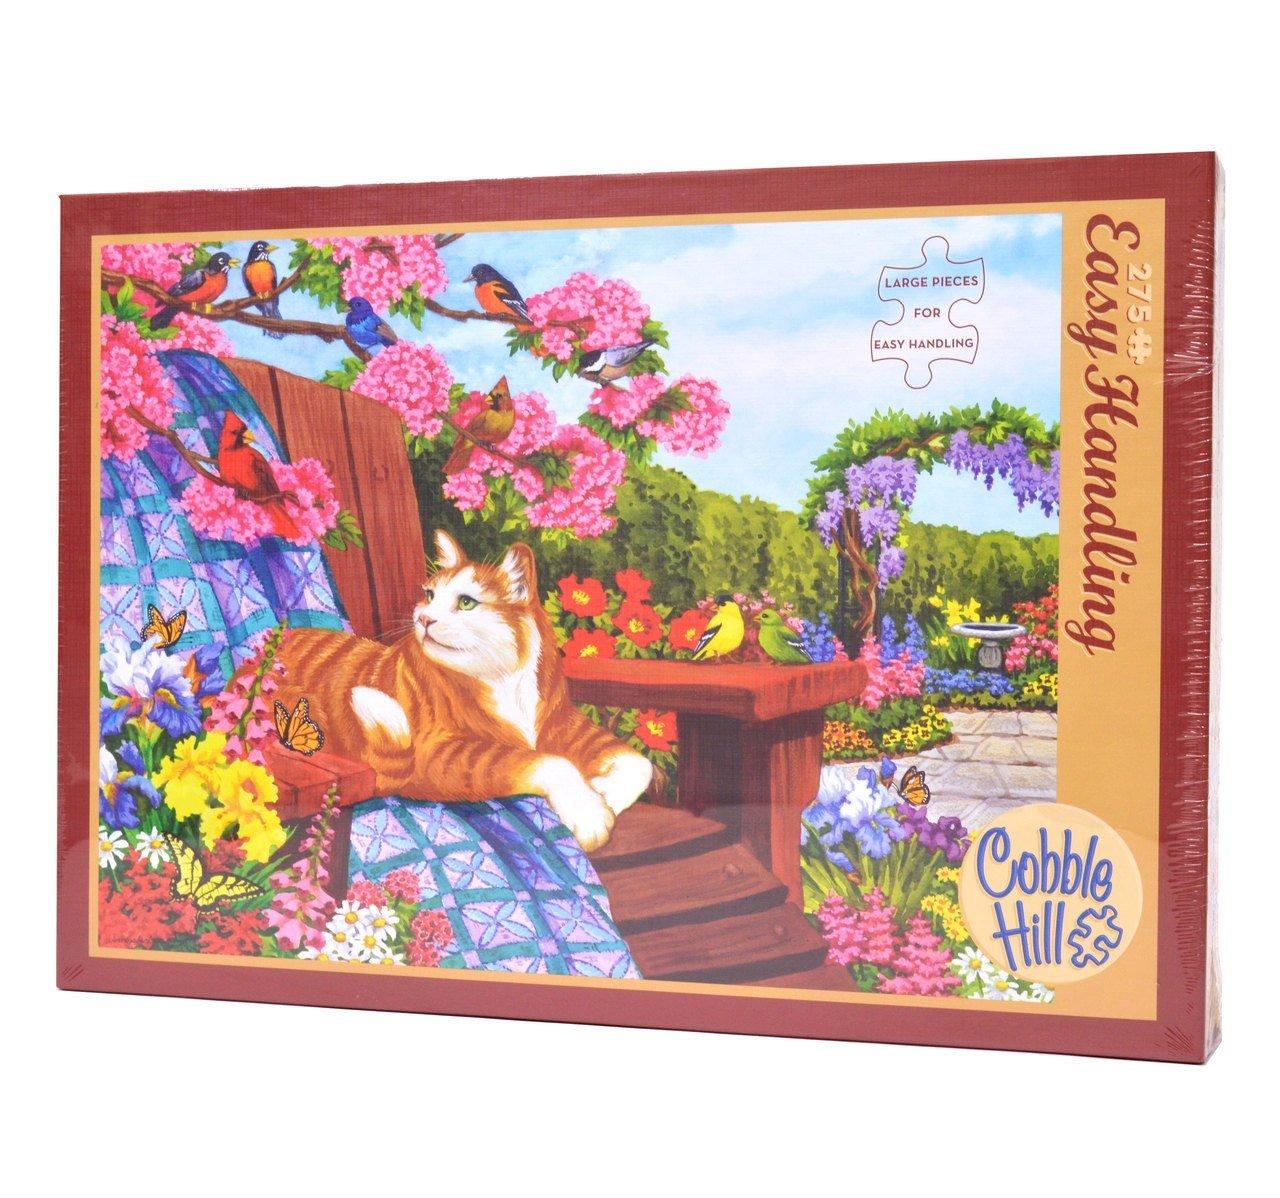 Spring Fling 275 Larger Piece Puzzle - Cobble HIll